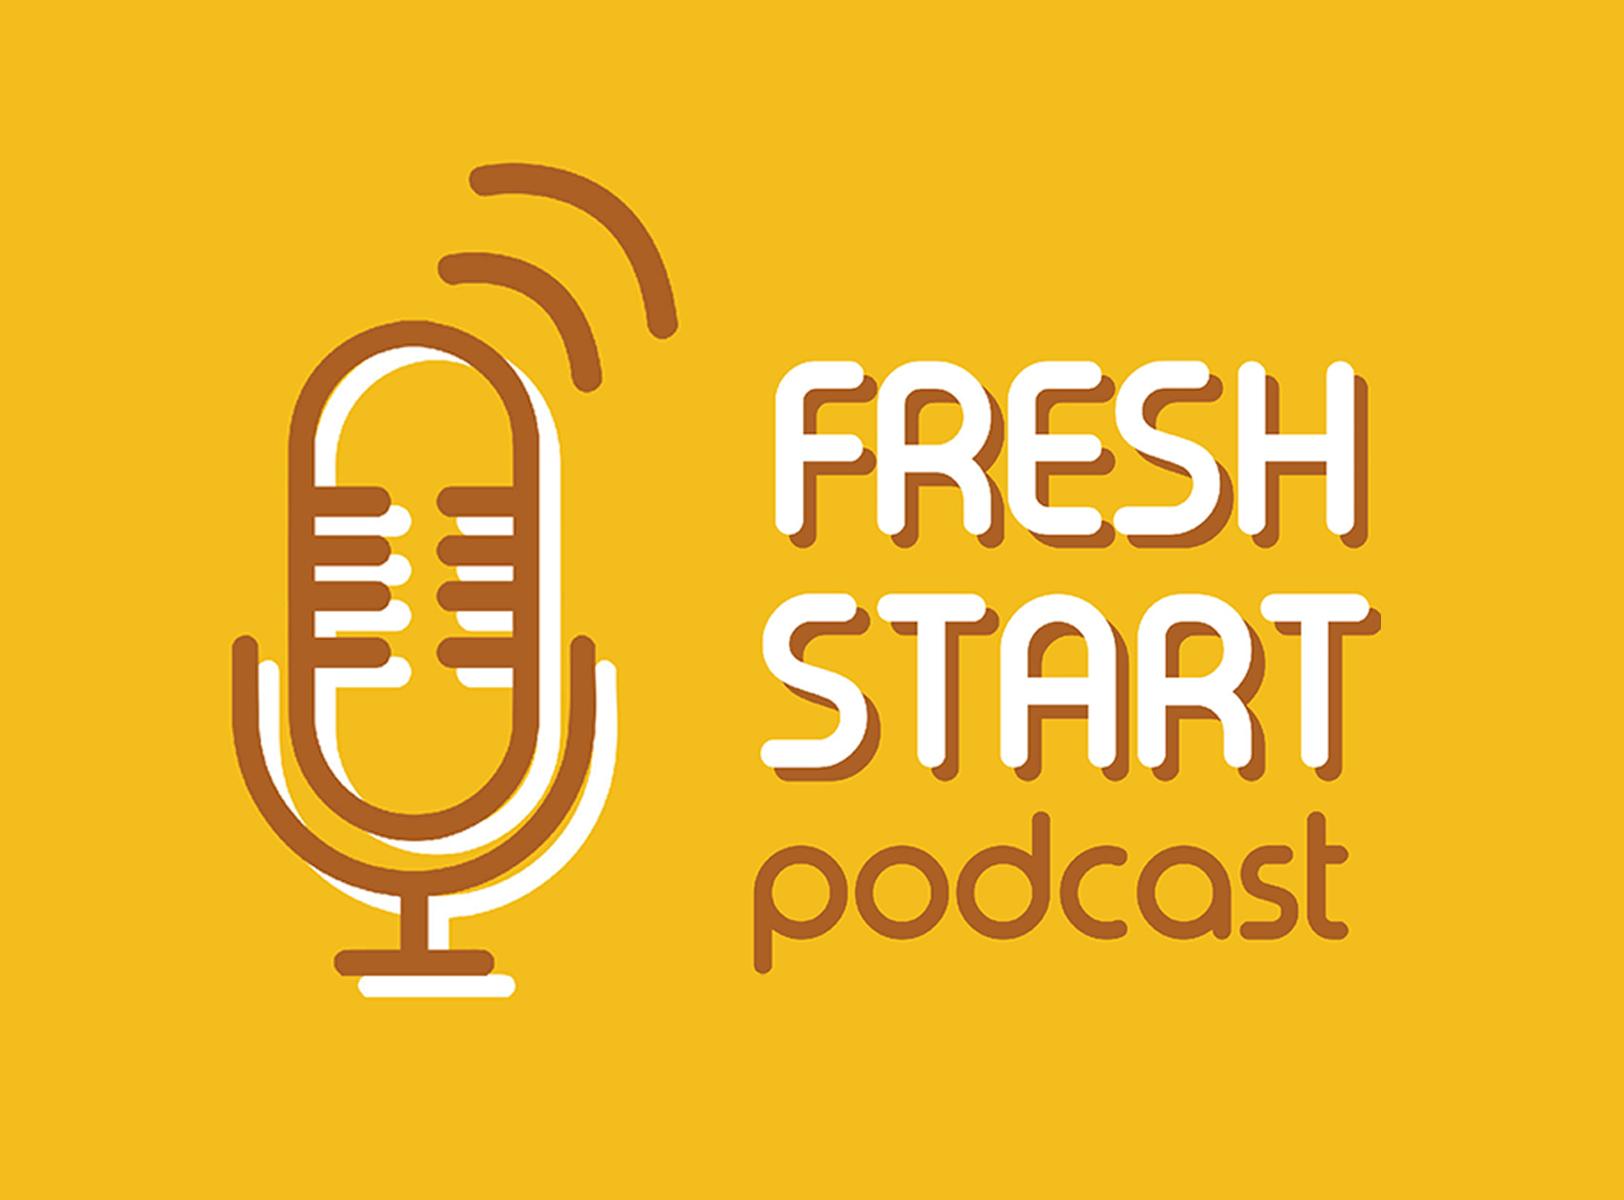 Fresh Start: Podcast News (9/16/2019 Mon.)